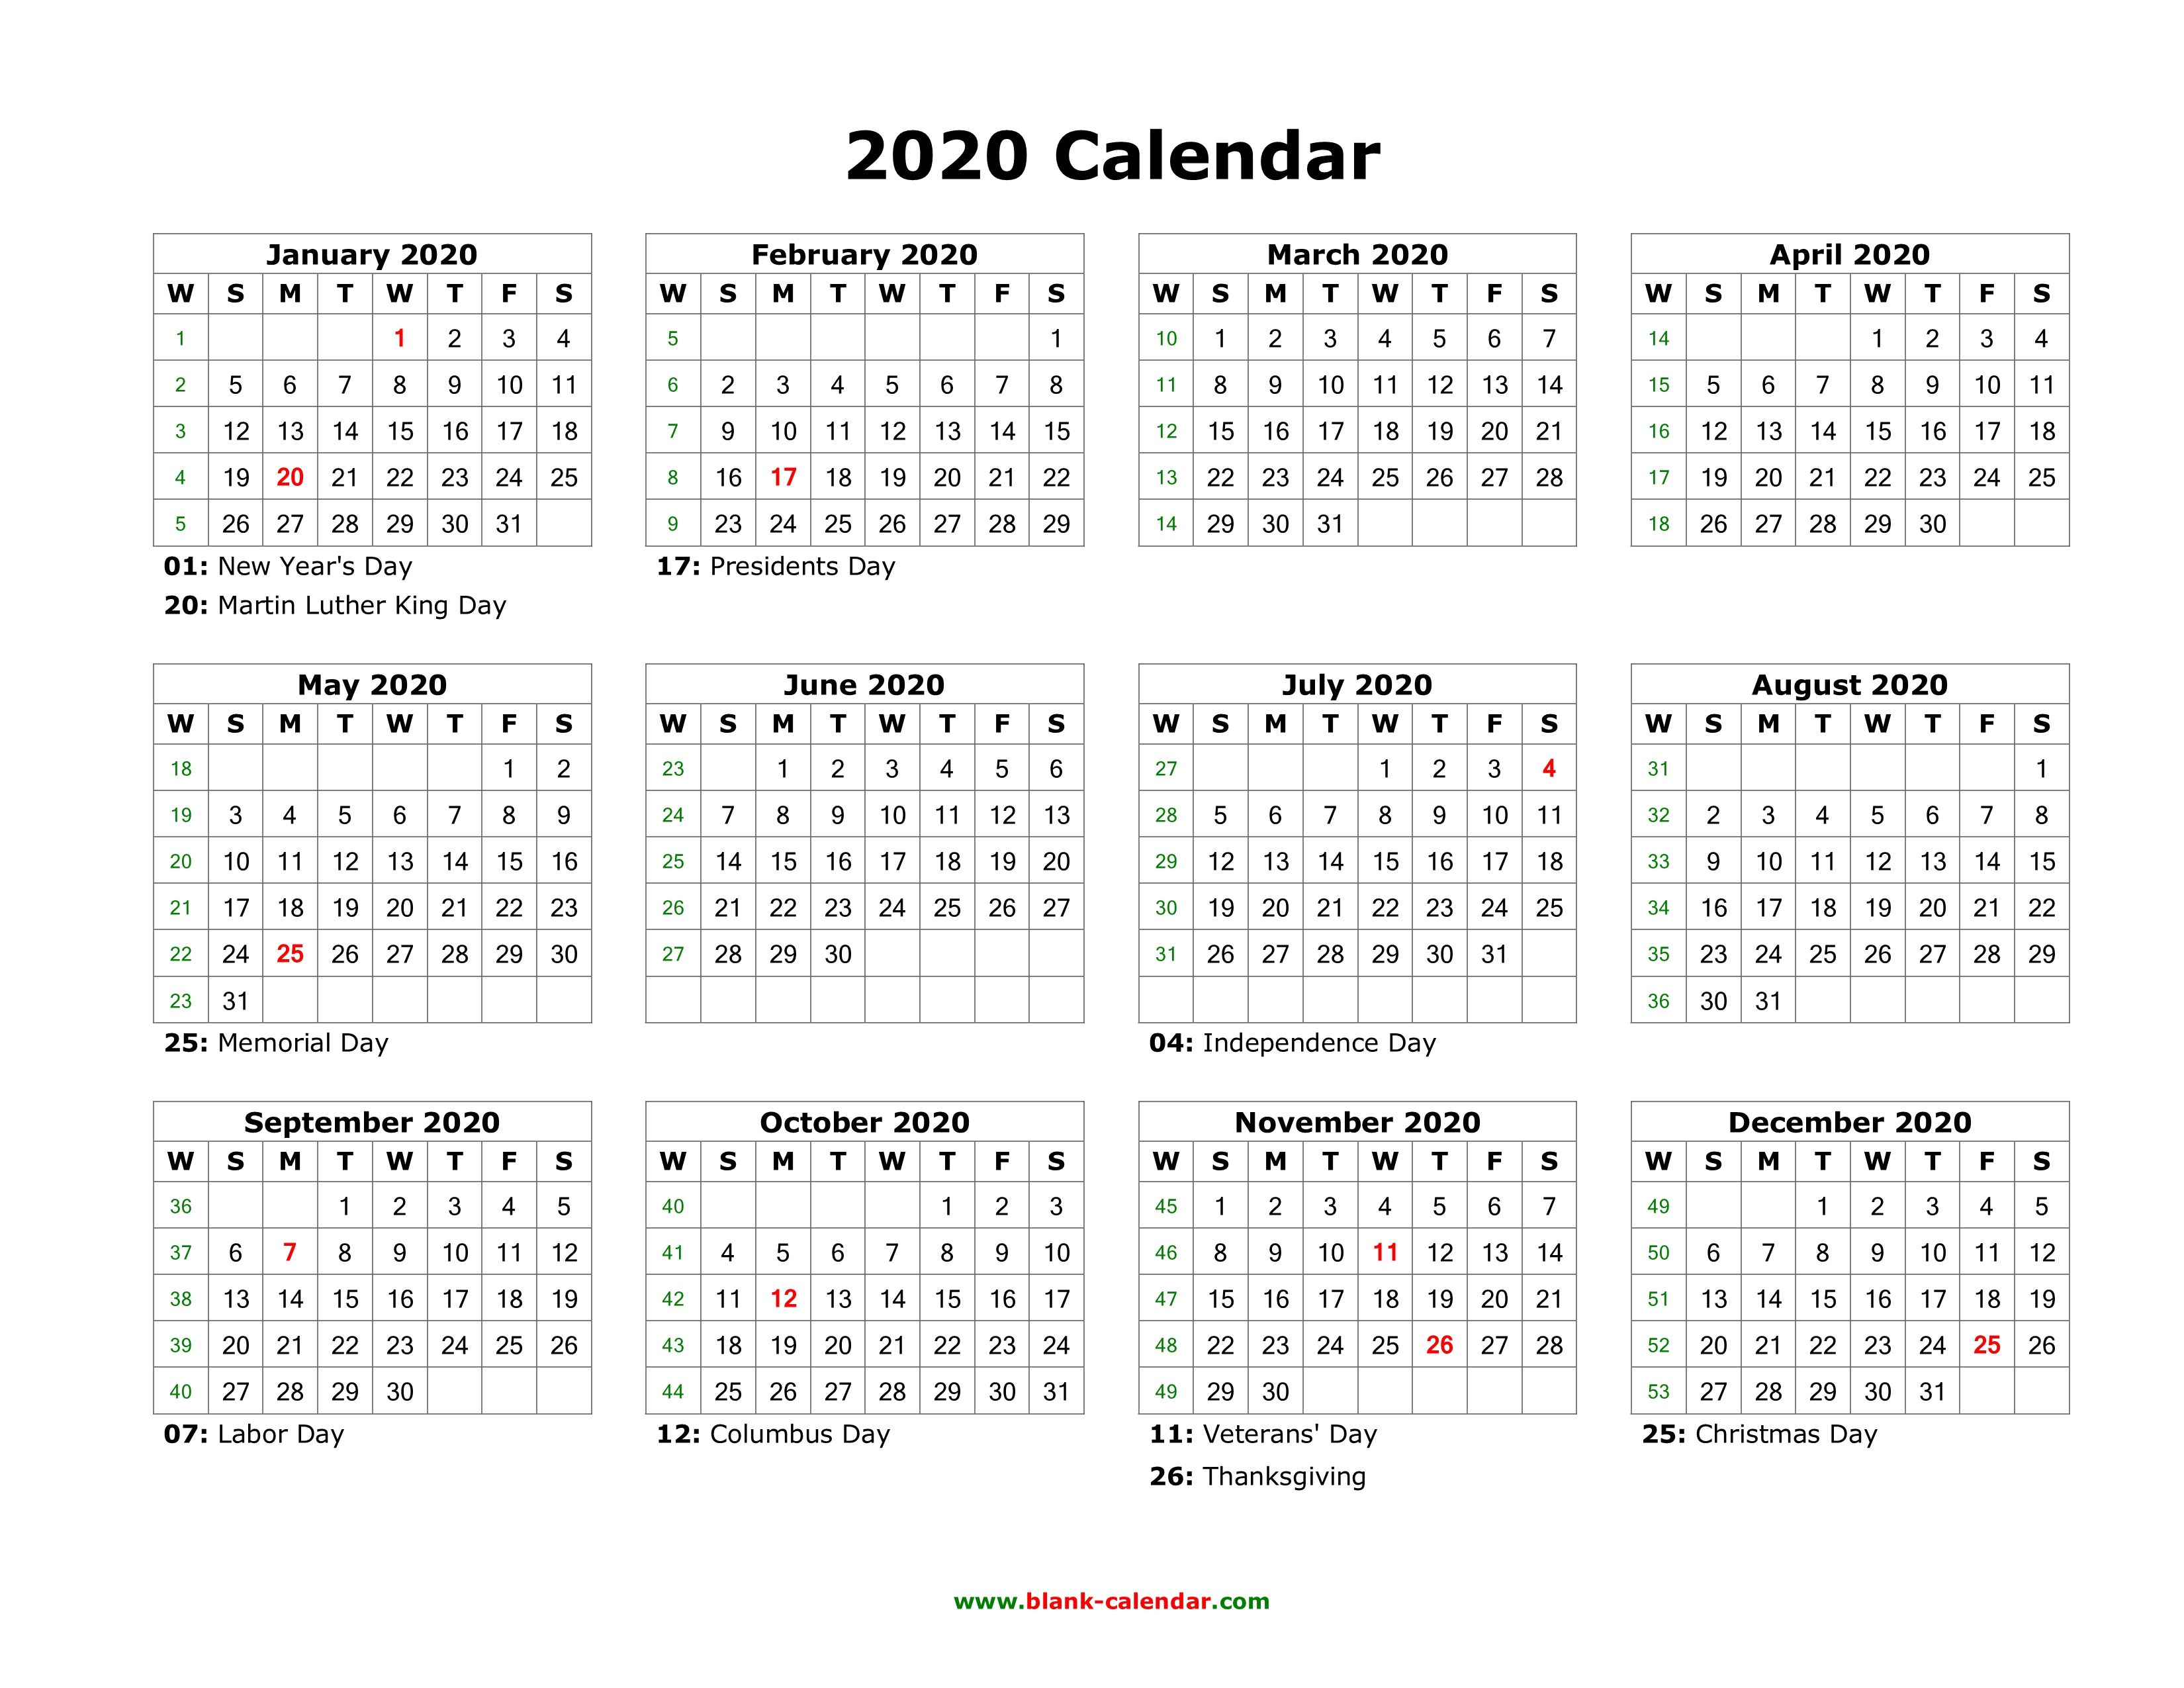 Blank Calendar 2020 | Free Download Calendar Templates throughout 2020 Calendar I Can Edit